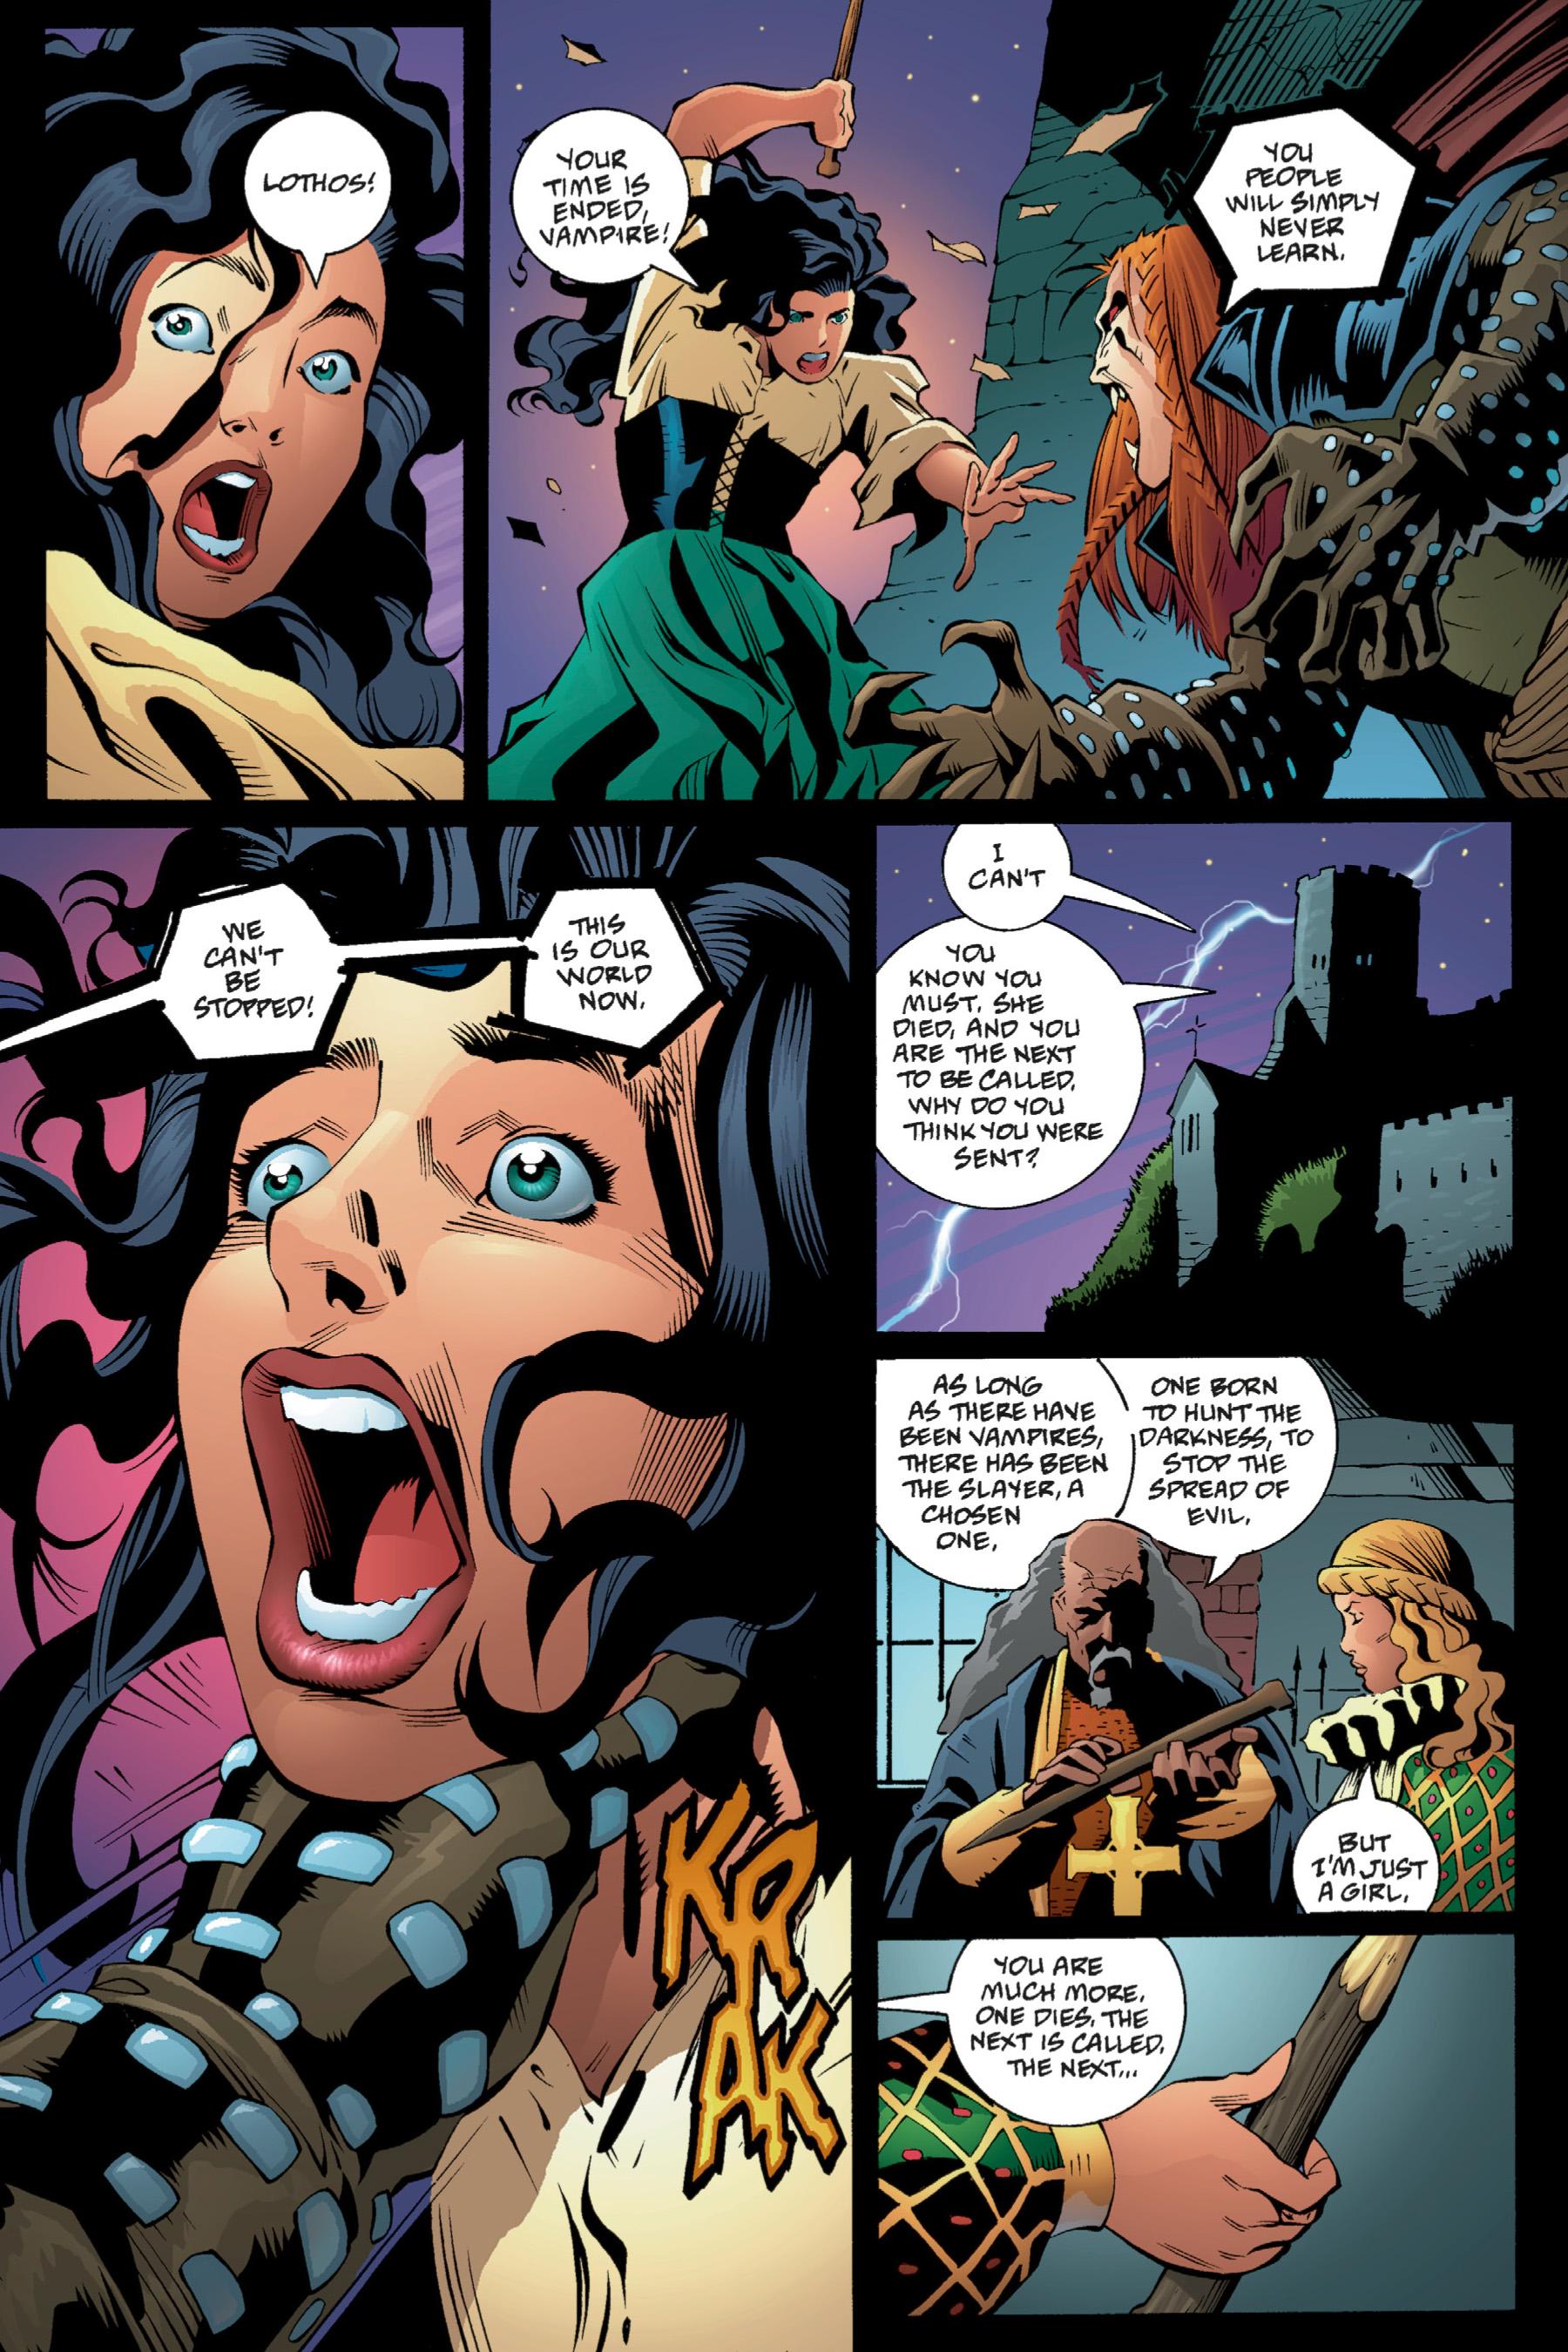 Read online Buffy the Vampire Slayer: Omnibus comic -  Issue # TPB 1 - 39